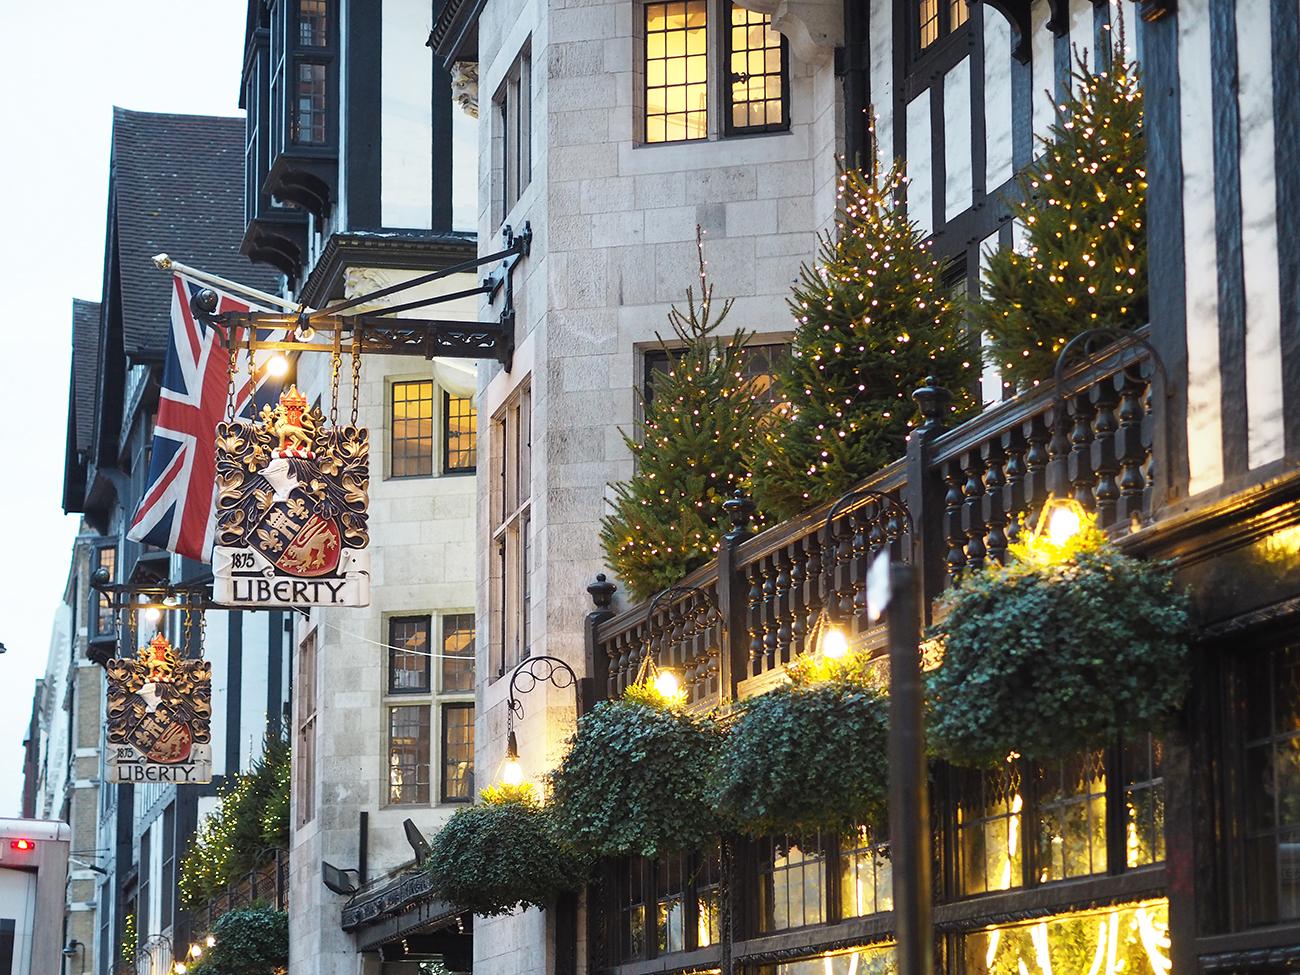 Liberty of London outside at christmas